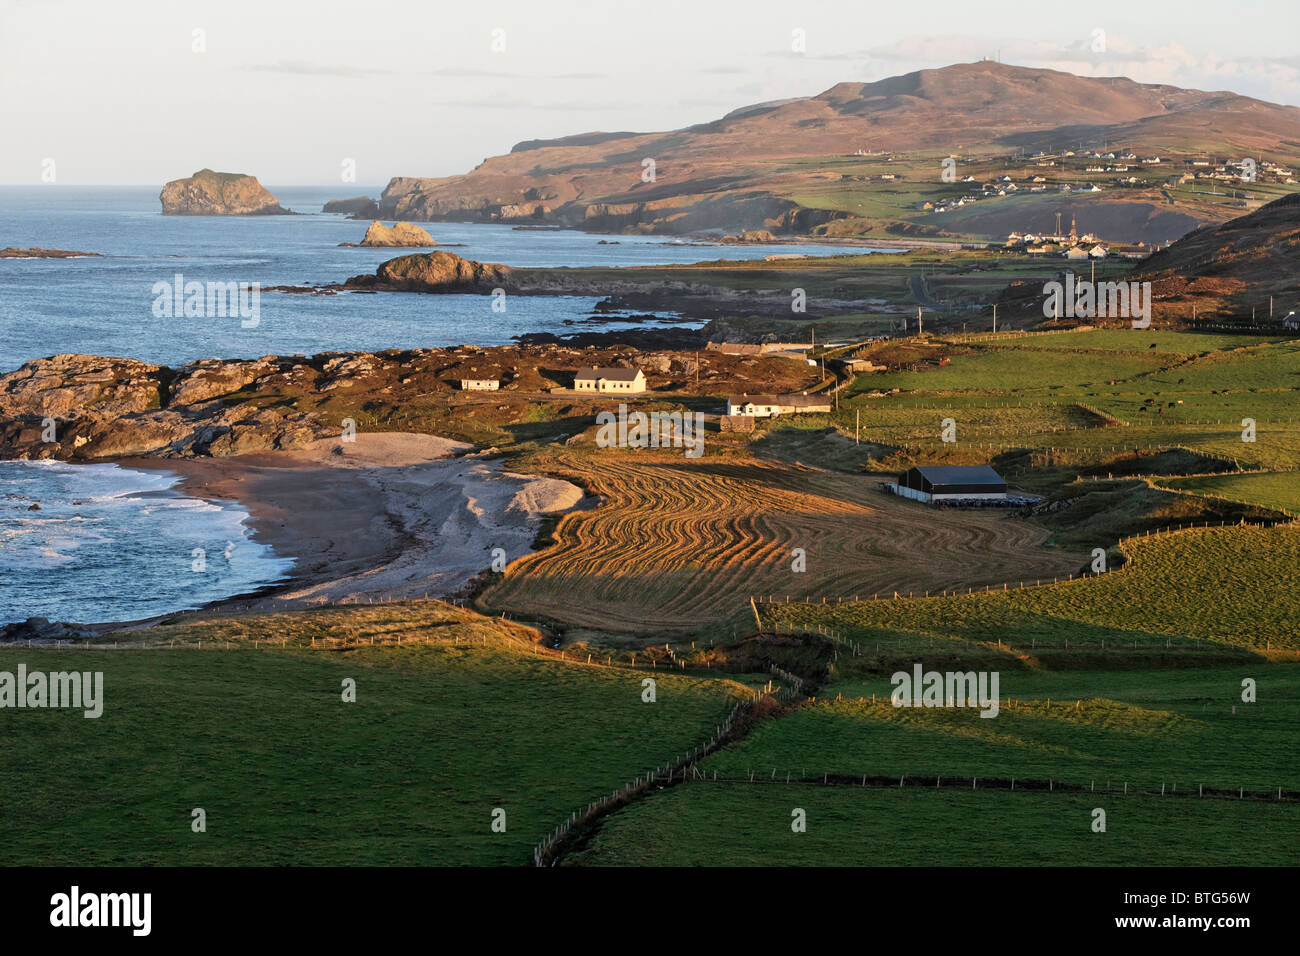 Vista desde Malin Head, sobre las playas de Ballyhillion levantada, Península de Inishowen, Condado de Donegal, Imagen De Stock